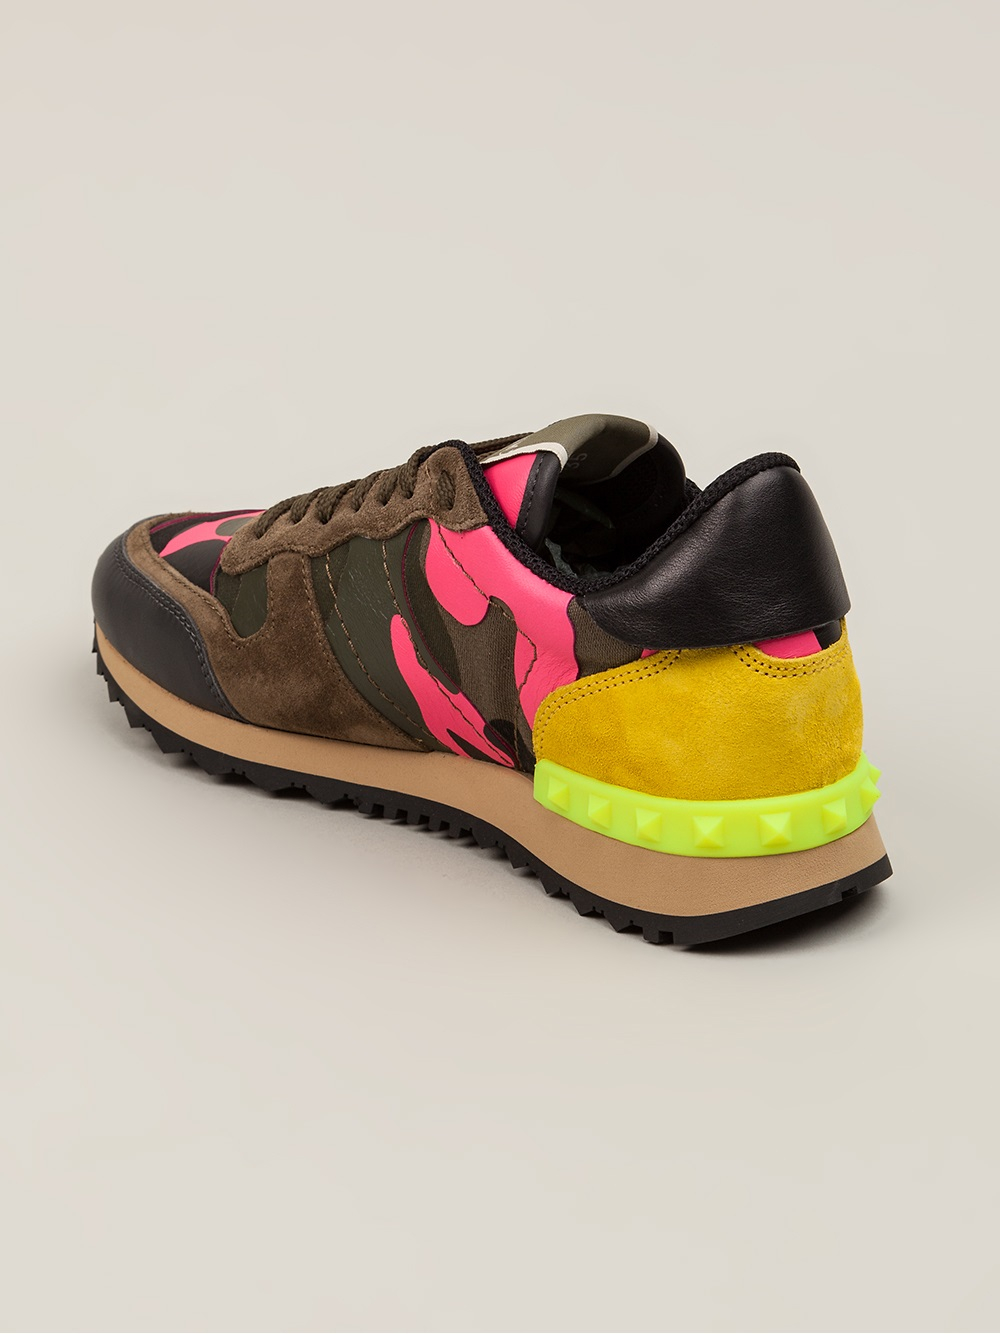 5ed275cad1 Lyst - Valentino Rockstud Sneaker in Pink